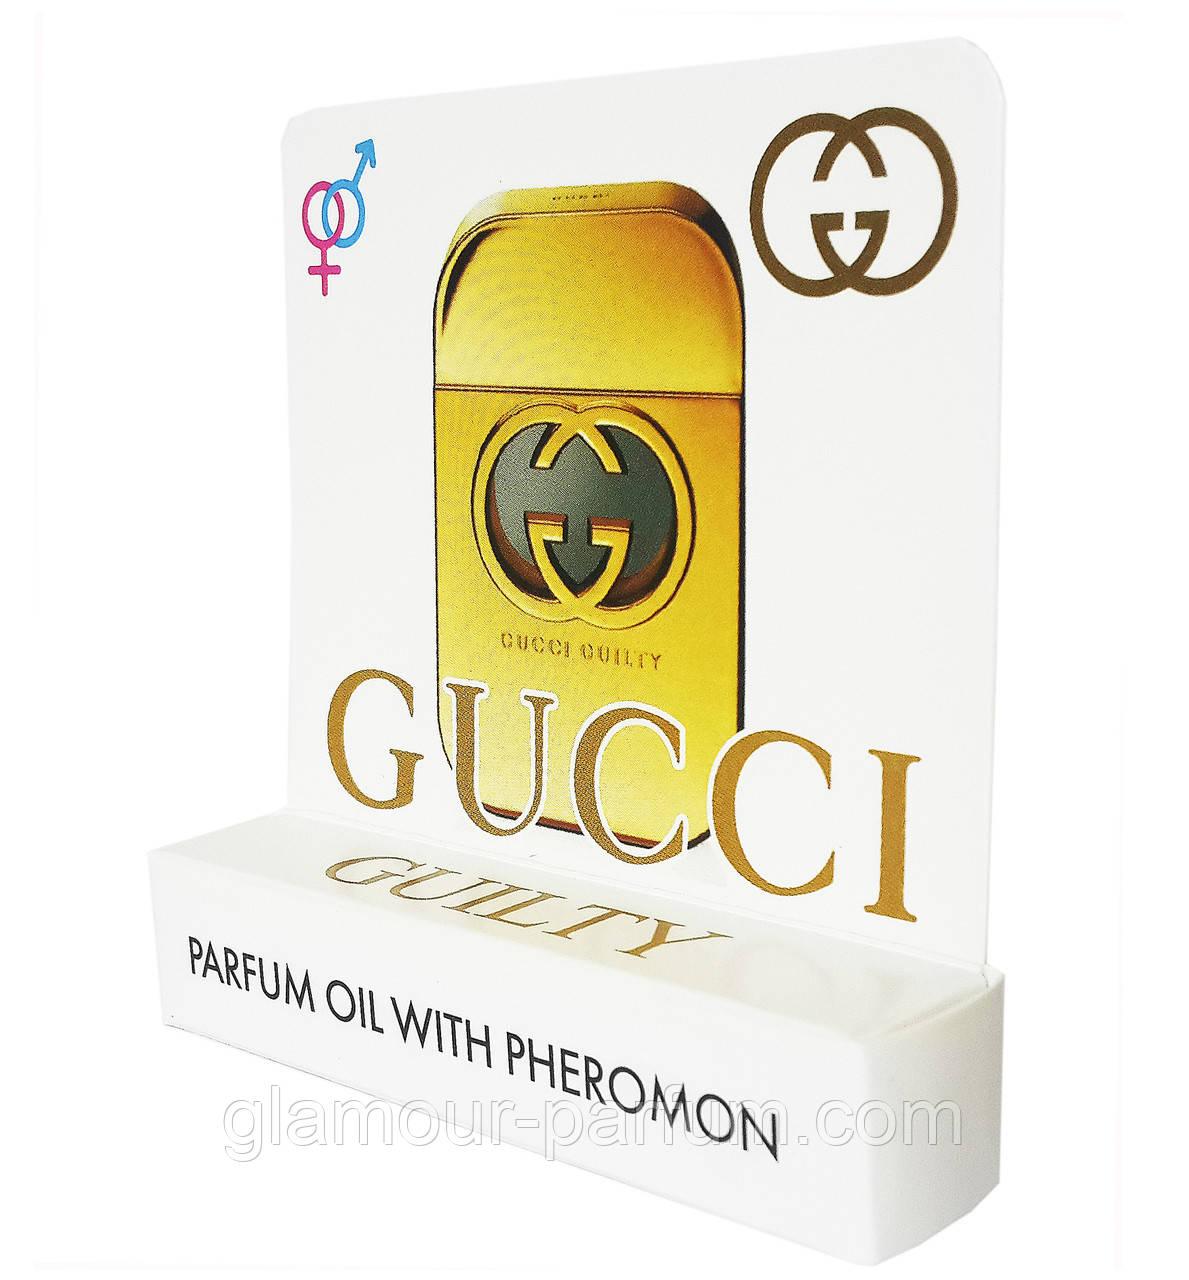 Мини парфюм с феромонами Gucci Guilty Pour Femme (Гуччи Гилти пур фемм) 5 мл (реплика)